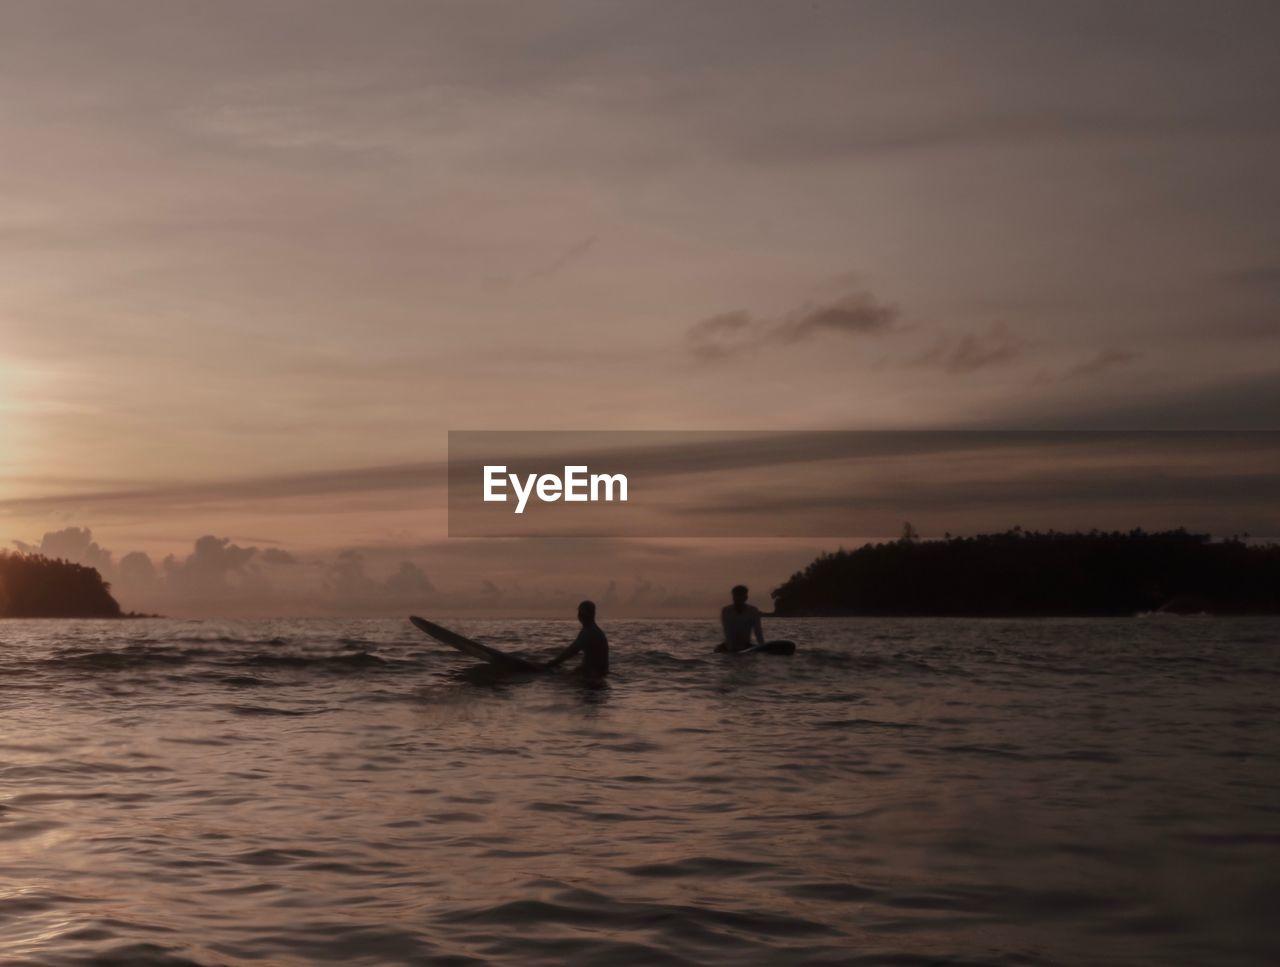 Men surfing in sea during sunset